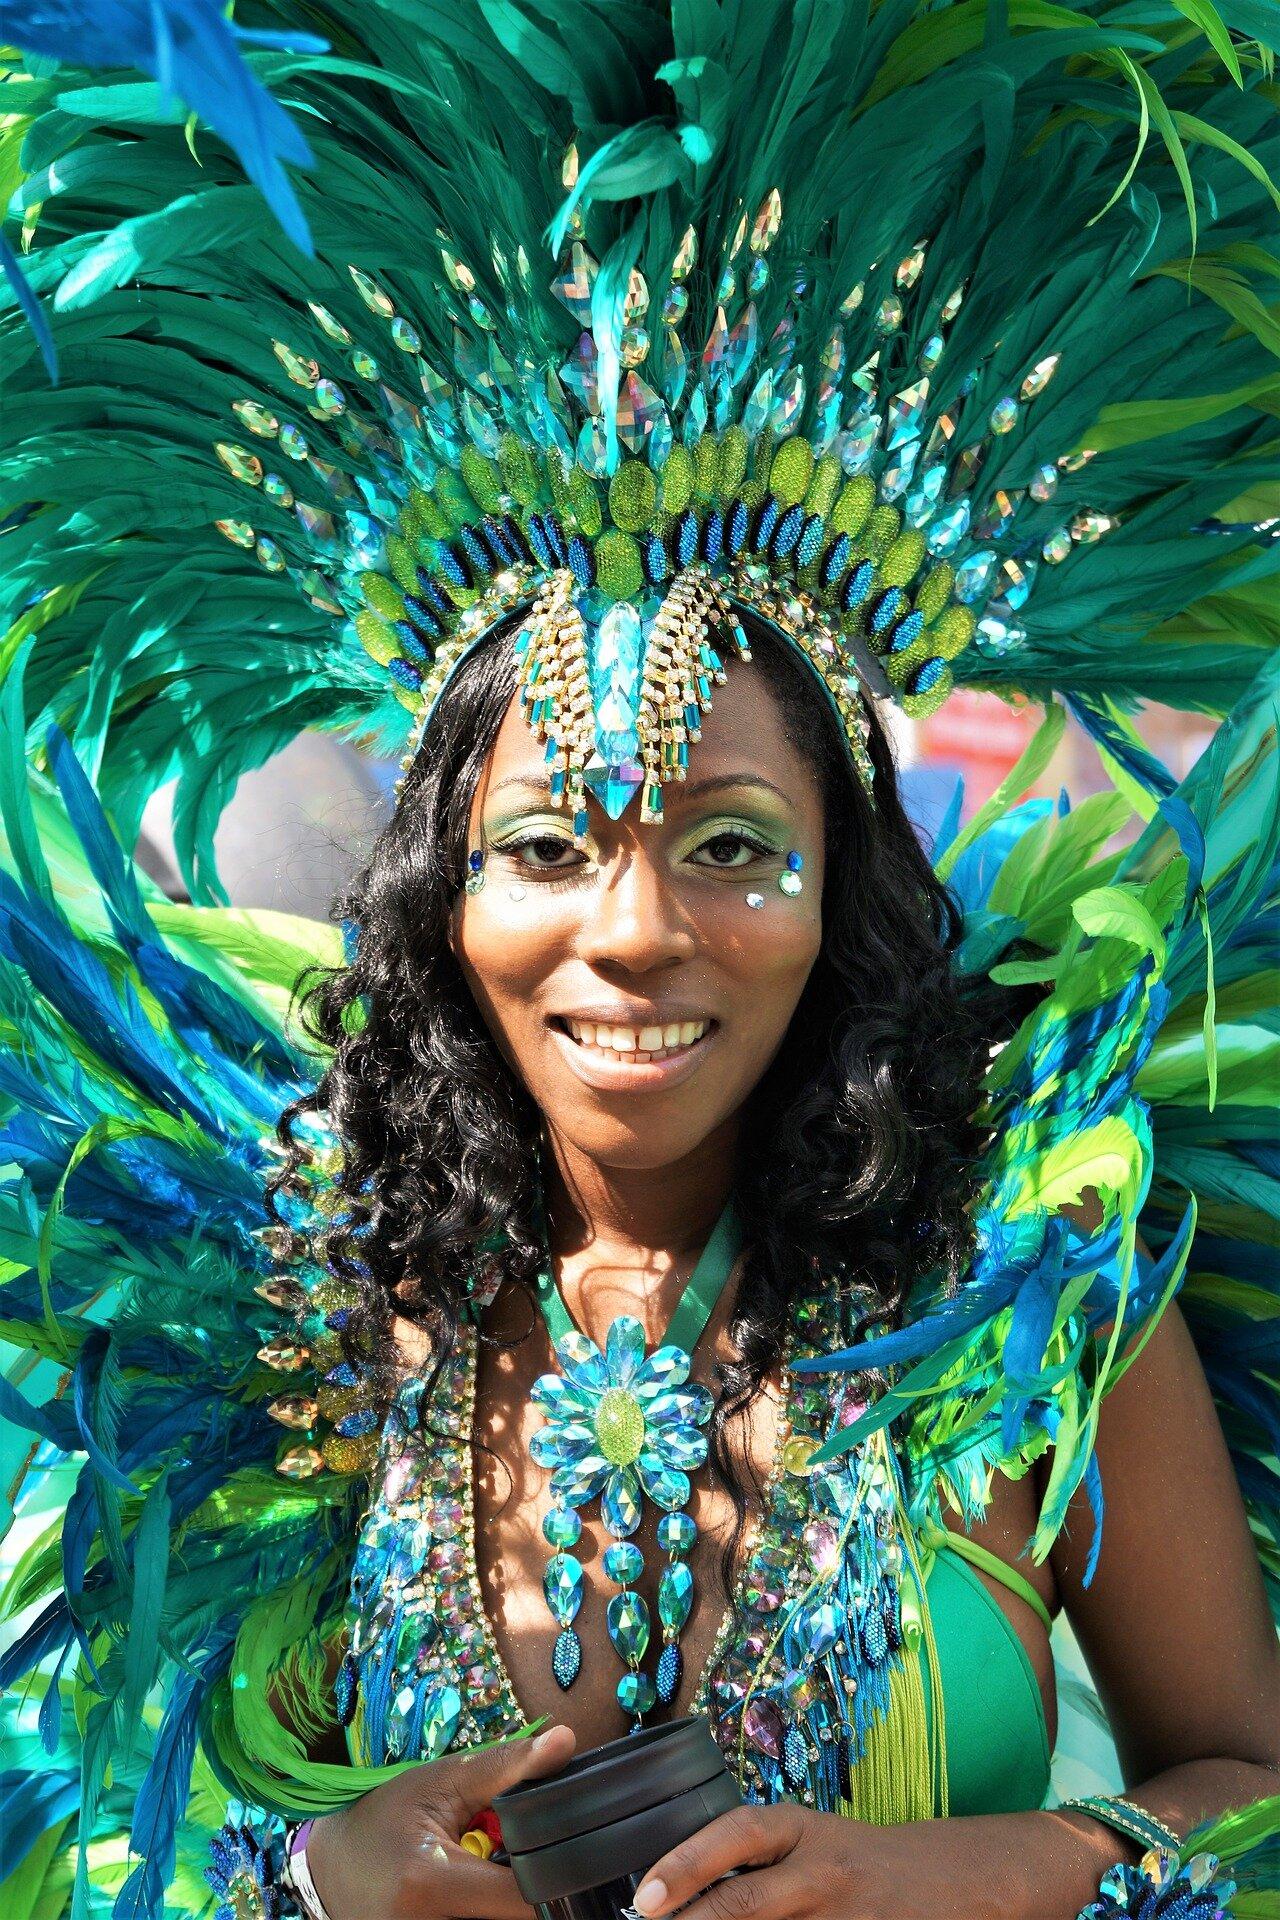 Passista no carnaval de Londres